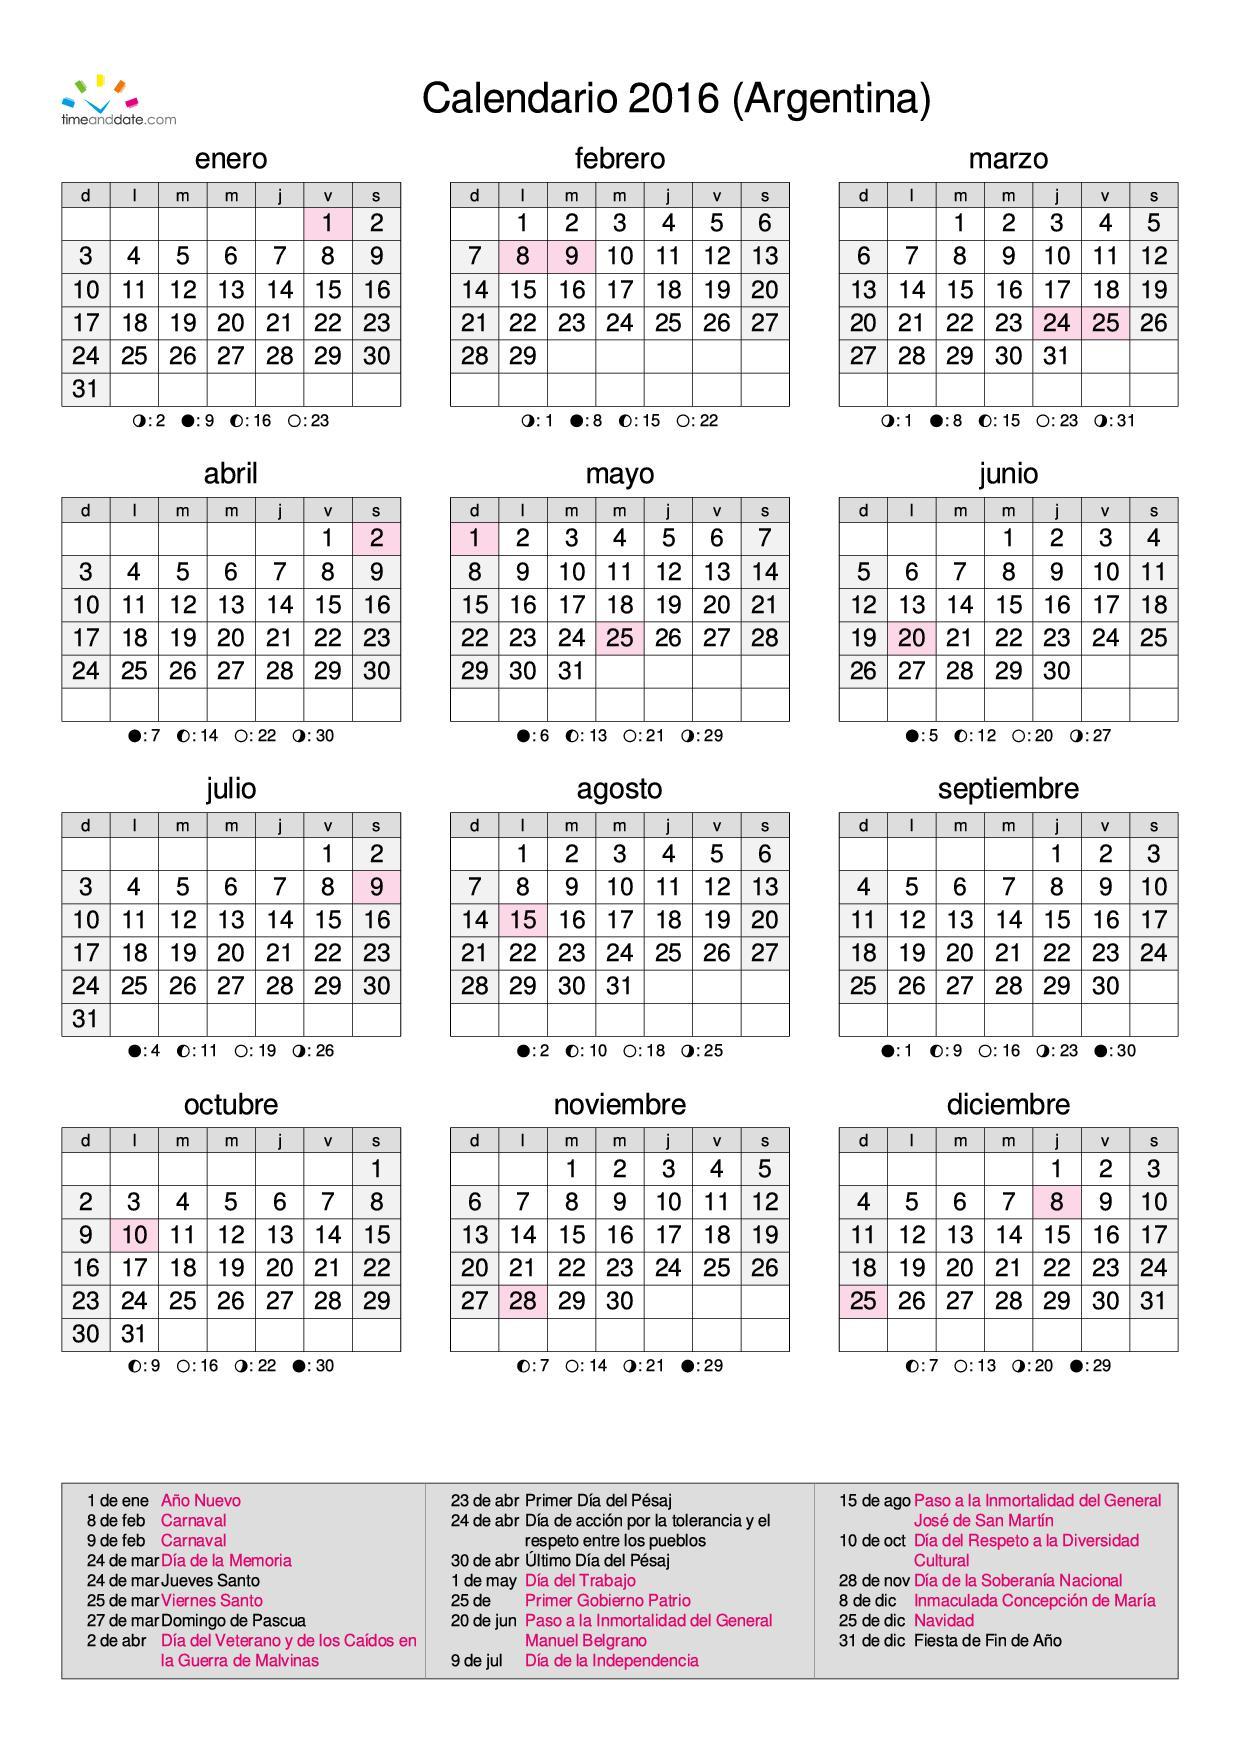 Calendario 2016 Argentina.Calendario Calendarios 2016 Para Argentina 3 Anuales